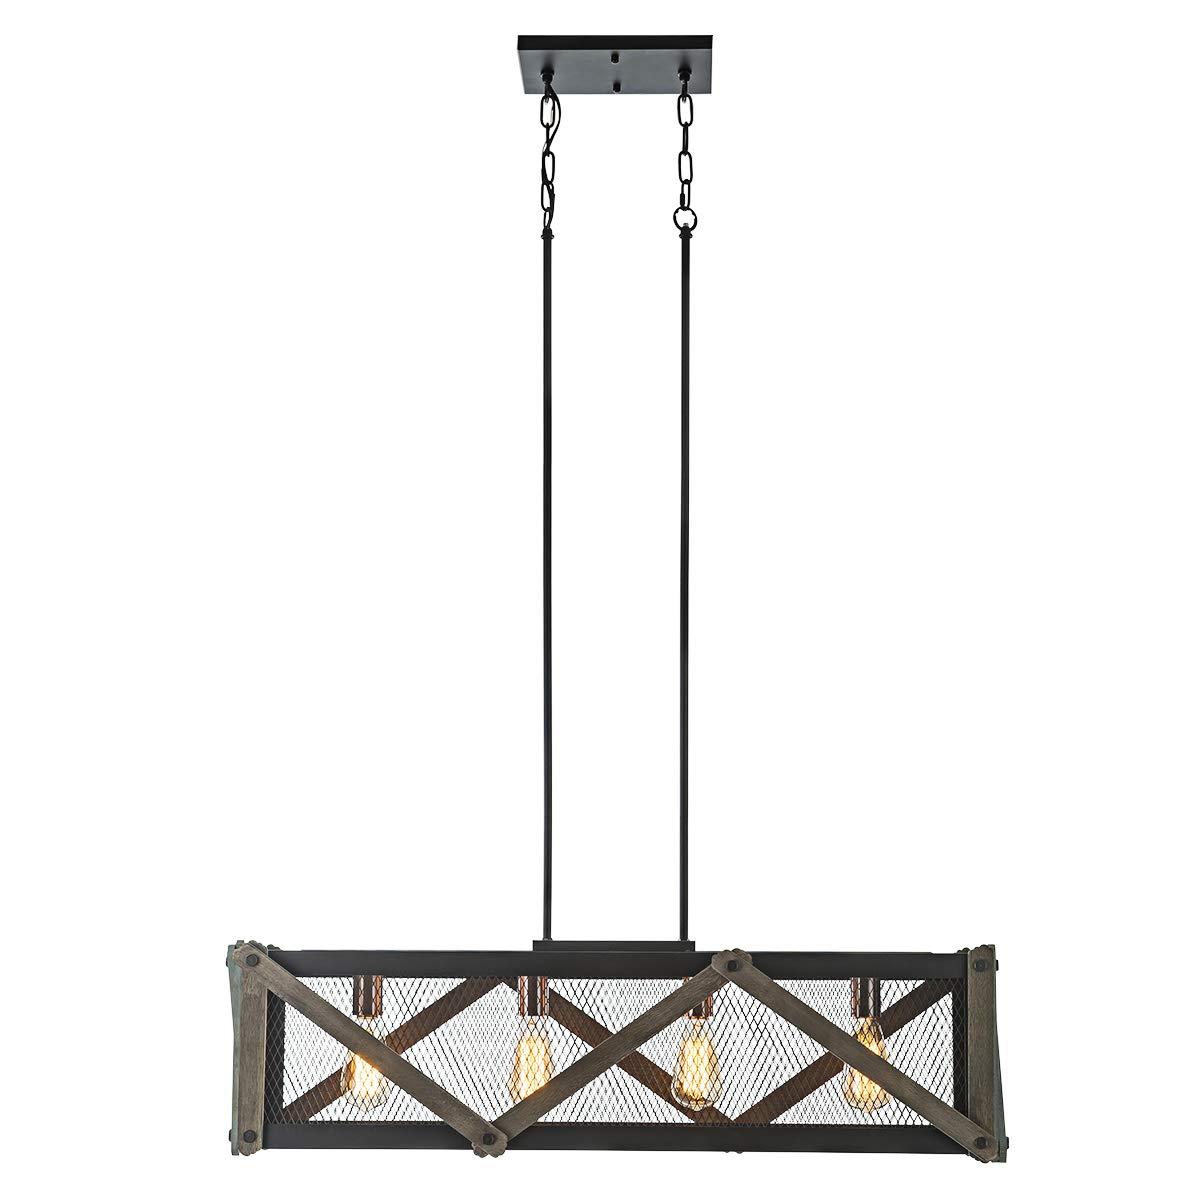 Lanros 4-Light Rustic Kitchen Island Pendant, Wood Rectangular Mesh Cage Chandelier with Matte Black Frame for Dining Room Table, Breakfast Bar